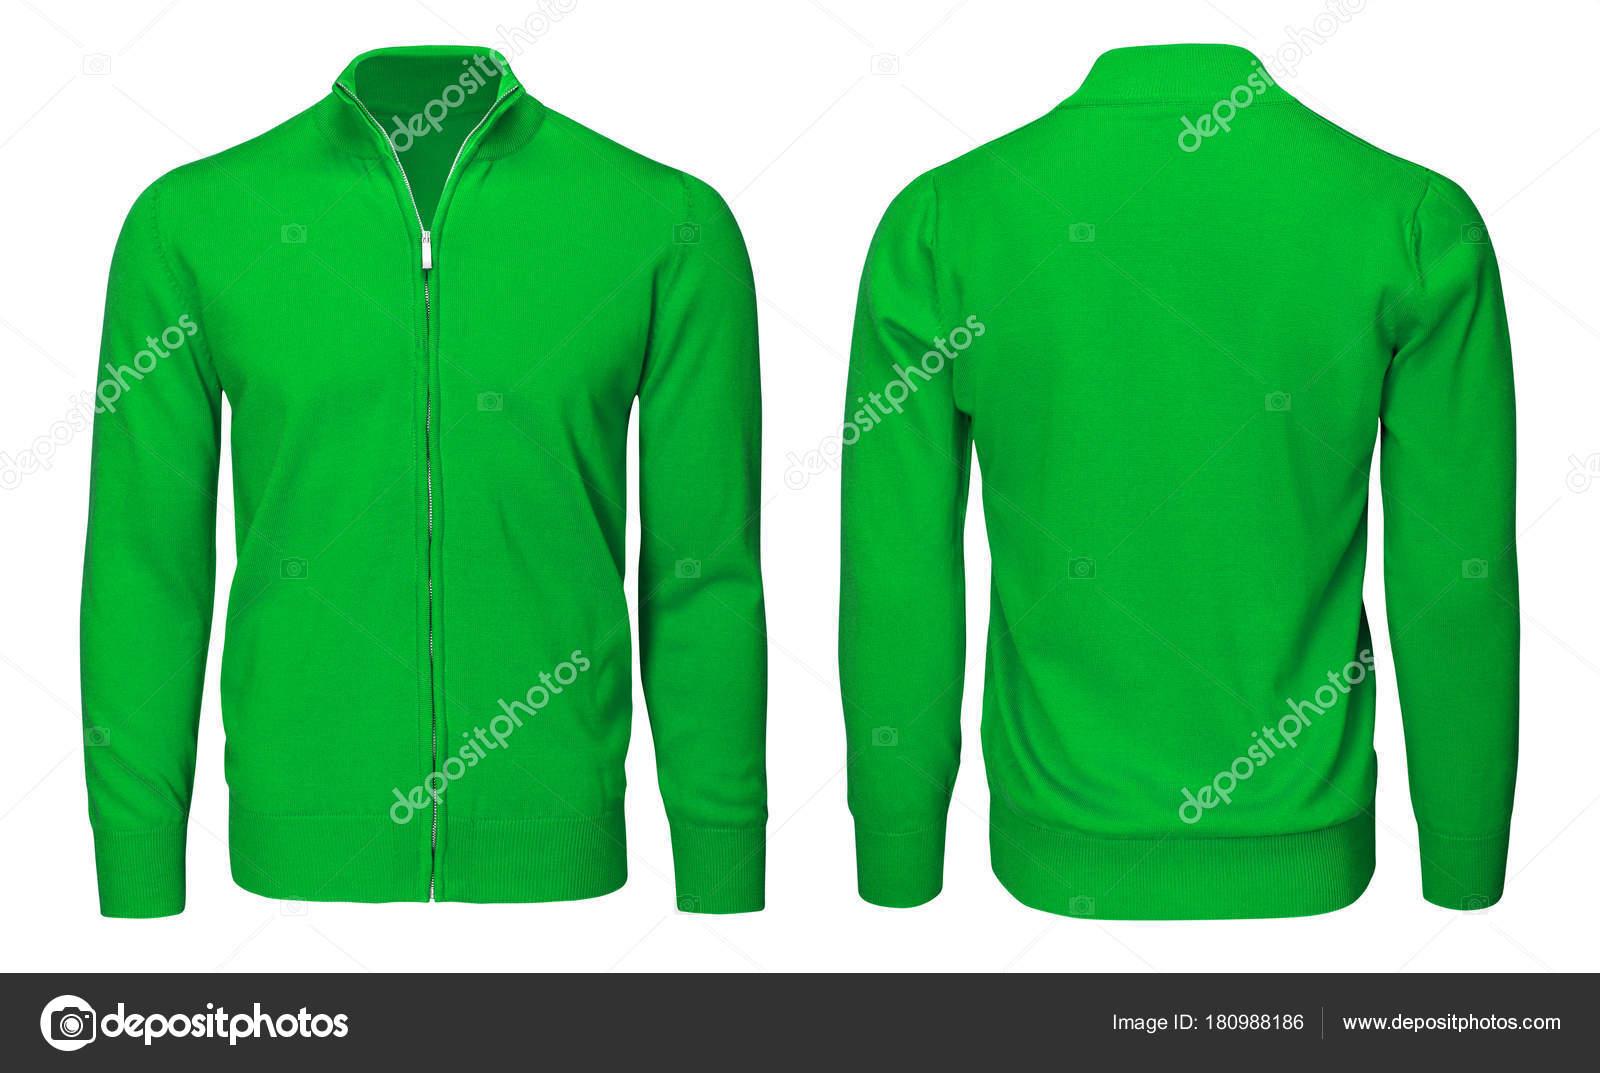 4e8a1c70add Blank template mens green sweatshirt long sleeve